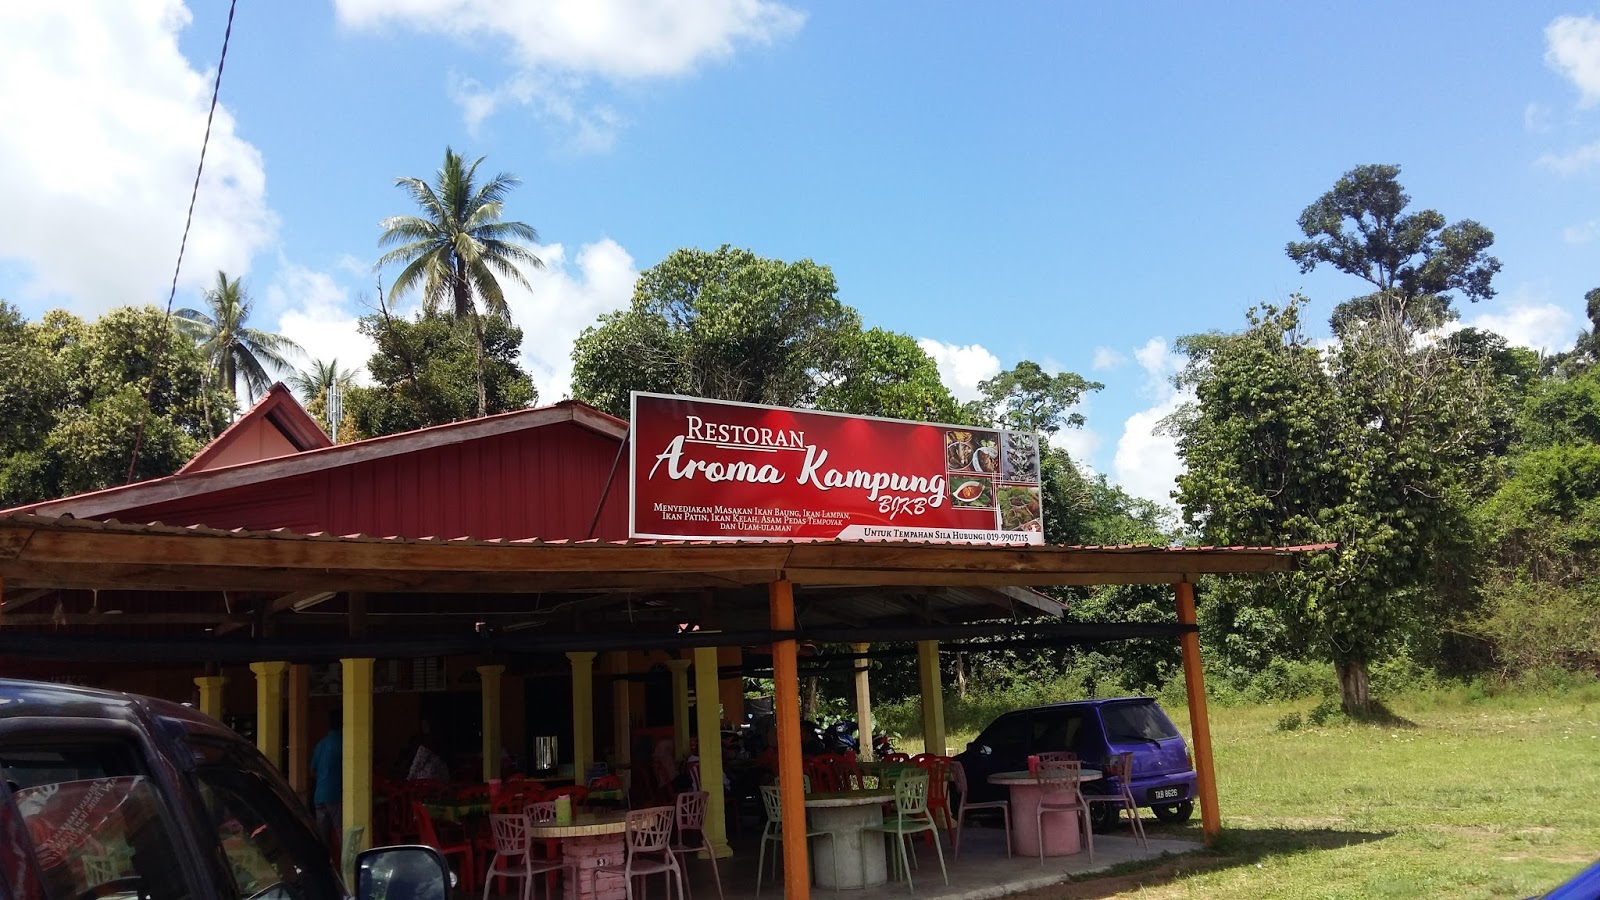 terengganu my heritage restoran aroma kampung, kg baung kualabenar bagai di kata, memang sedap menu menu di sini terutama asam pedas ikan baung yang berbeza dengan tempat tempat lain lebih menyelerakan bila dimakan